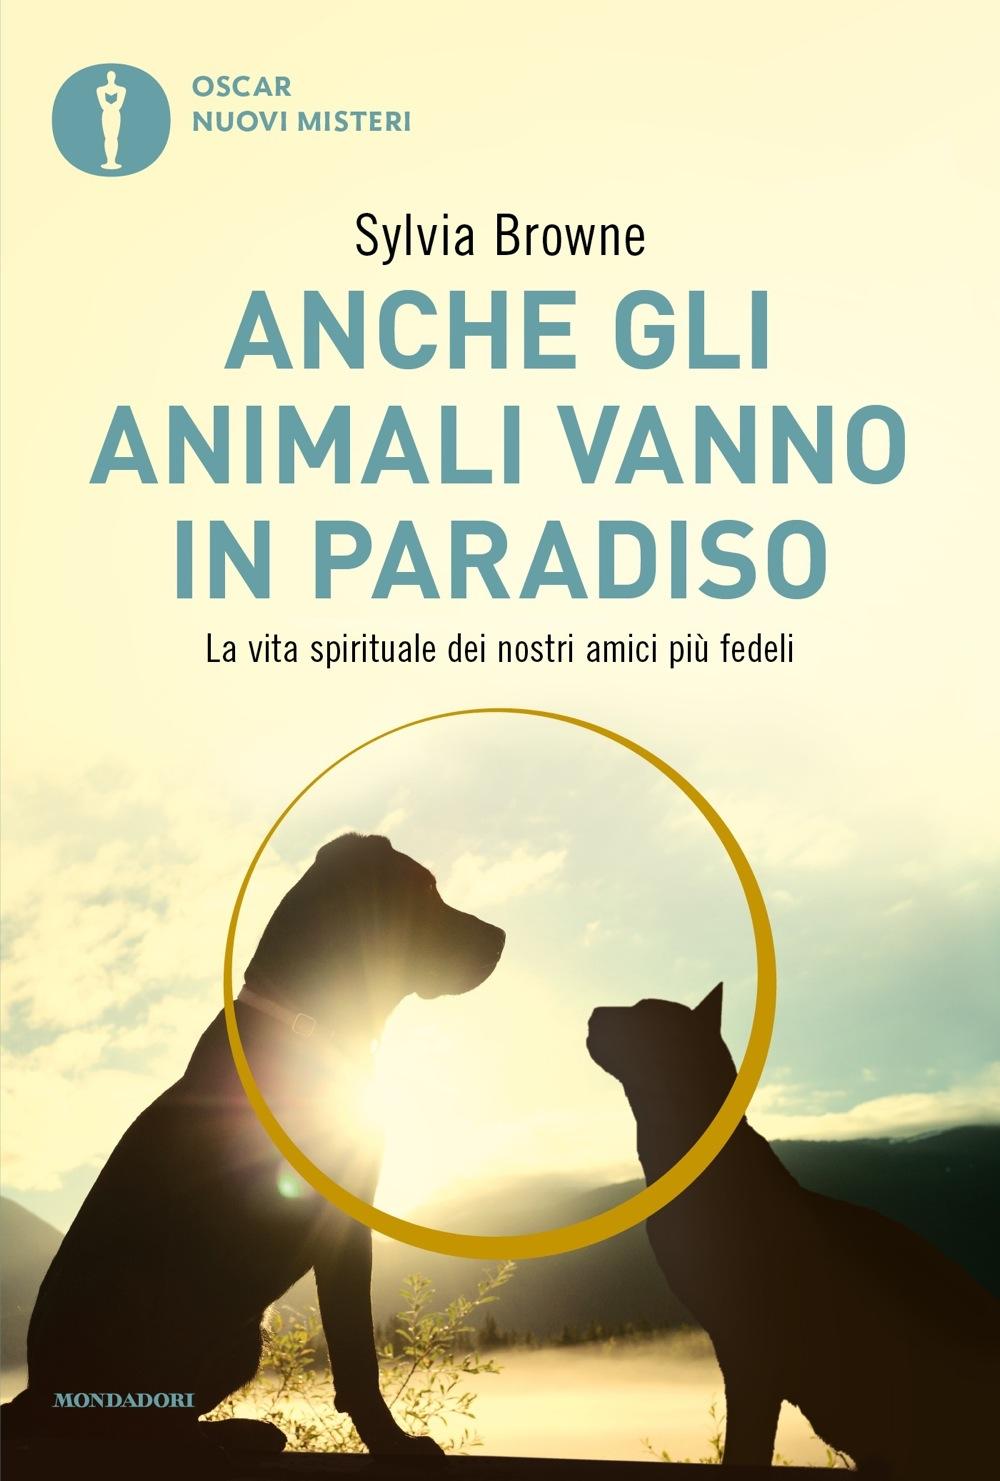 Anche gli animali vanno in paradiso - Sylvia Browne | Oscar Mondadori